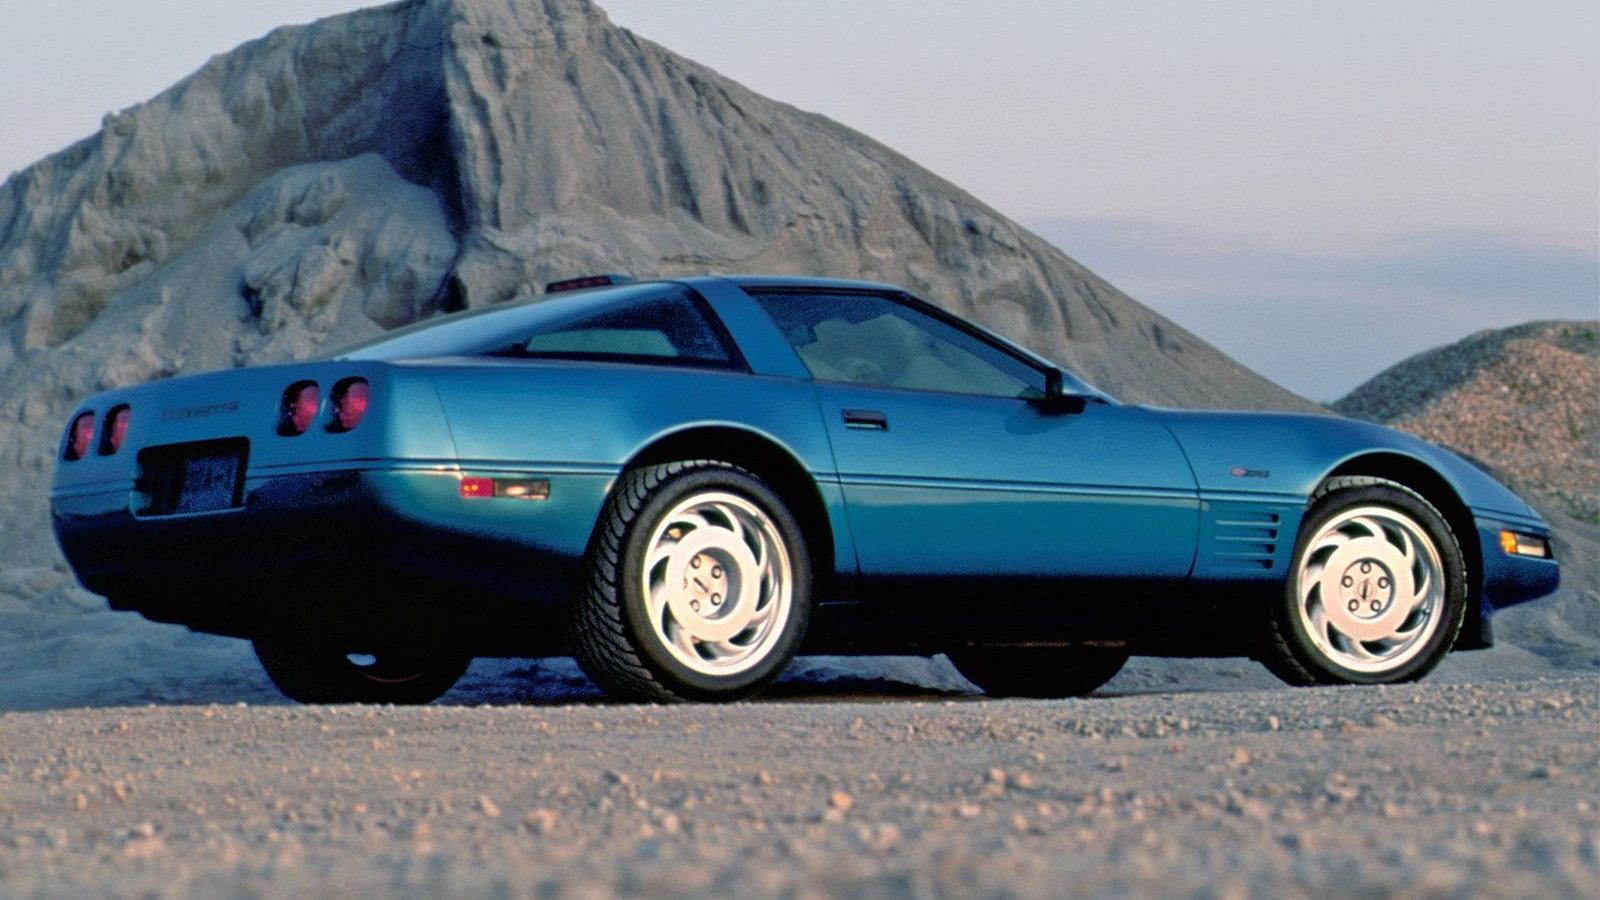 1991-1992: A Deserved Refresh